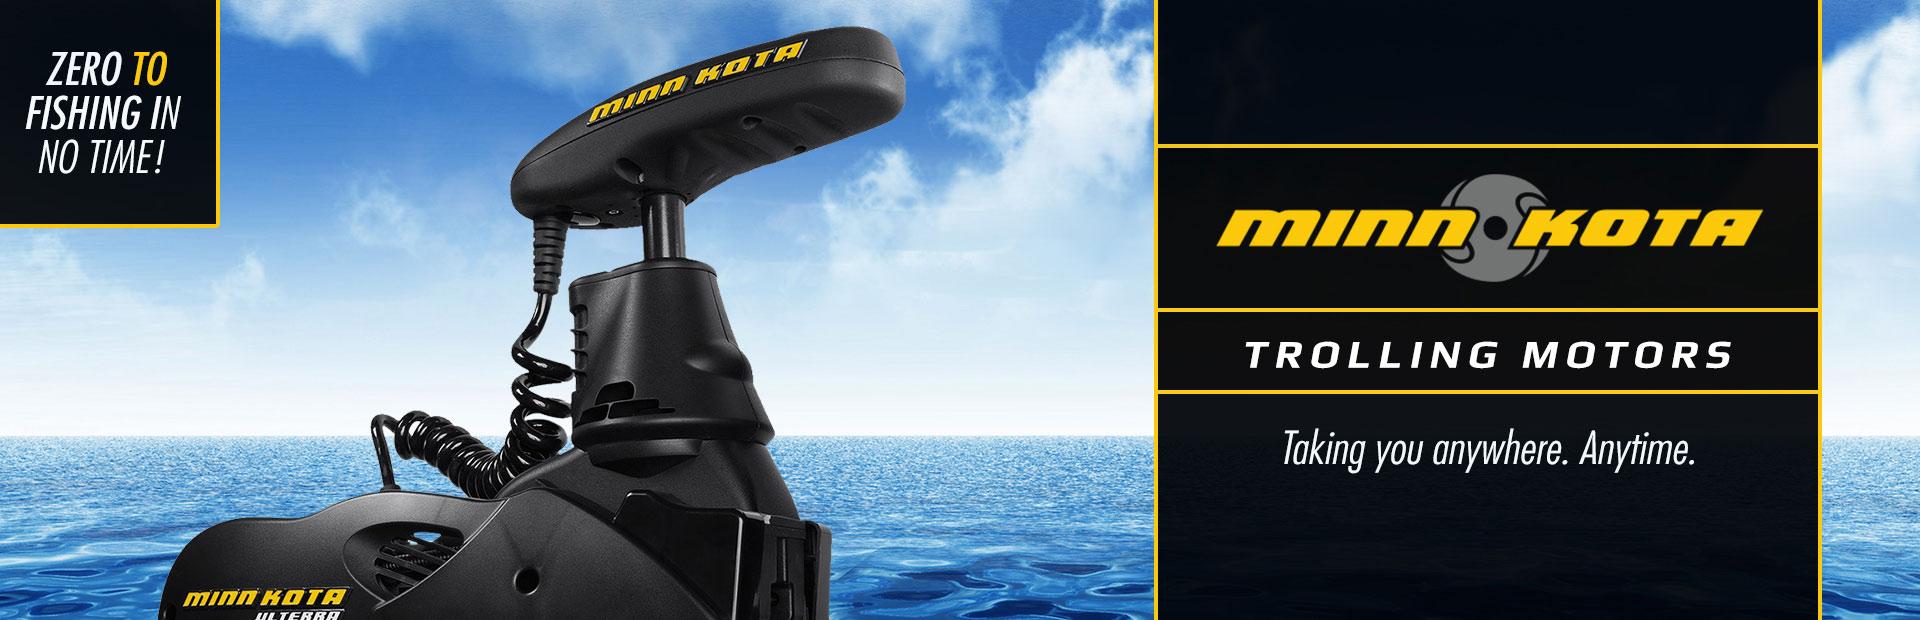 We carry Minn Kota trolling motors. Contact us for details.